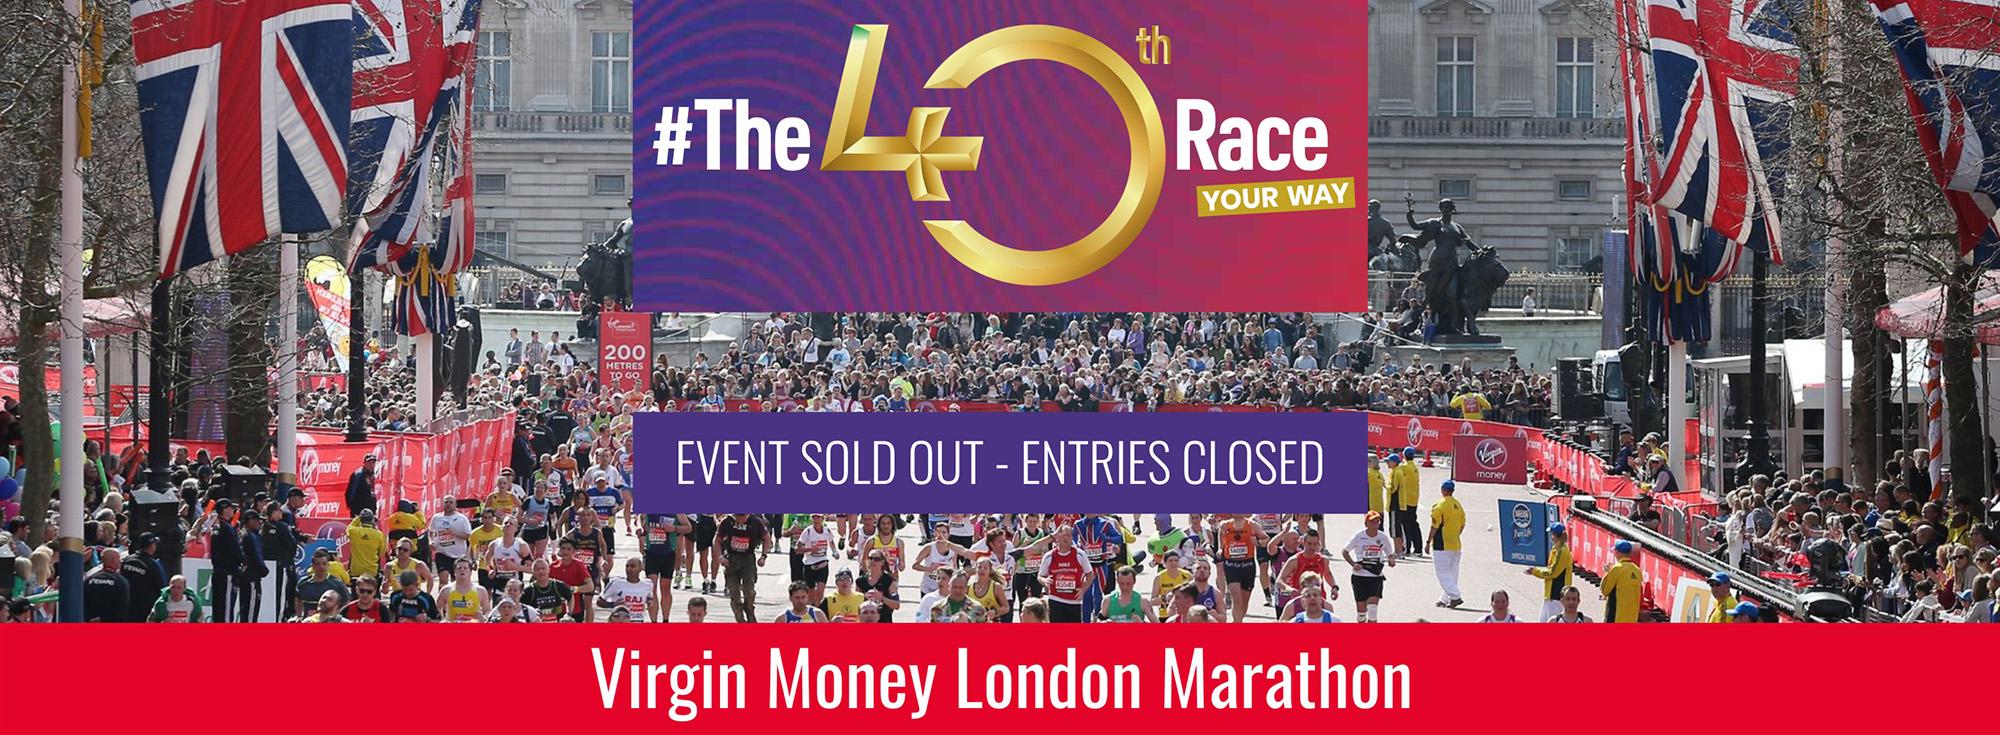 Virgin Money London Marathon - event sold out, entries closed